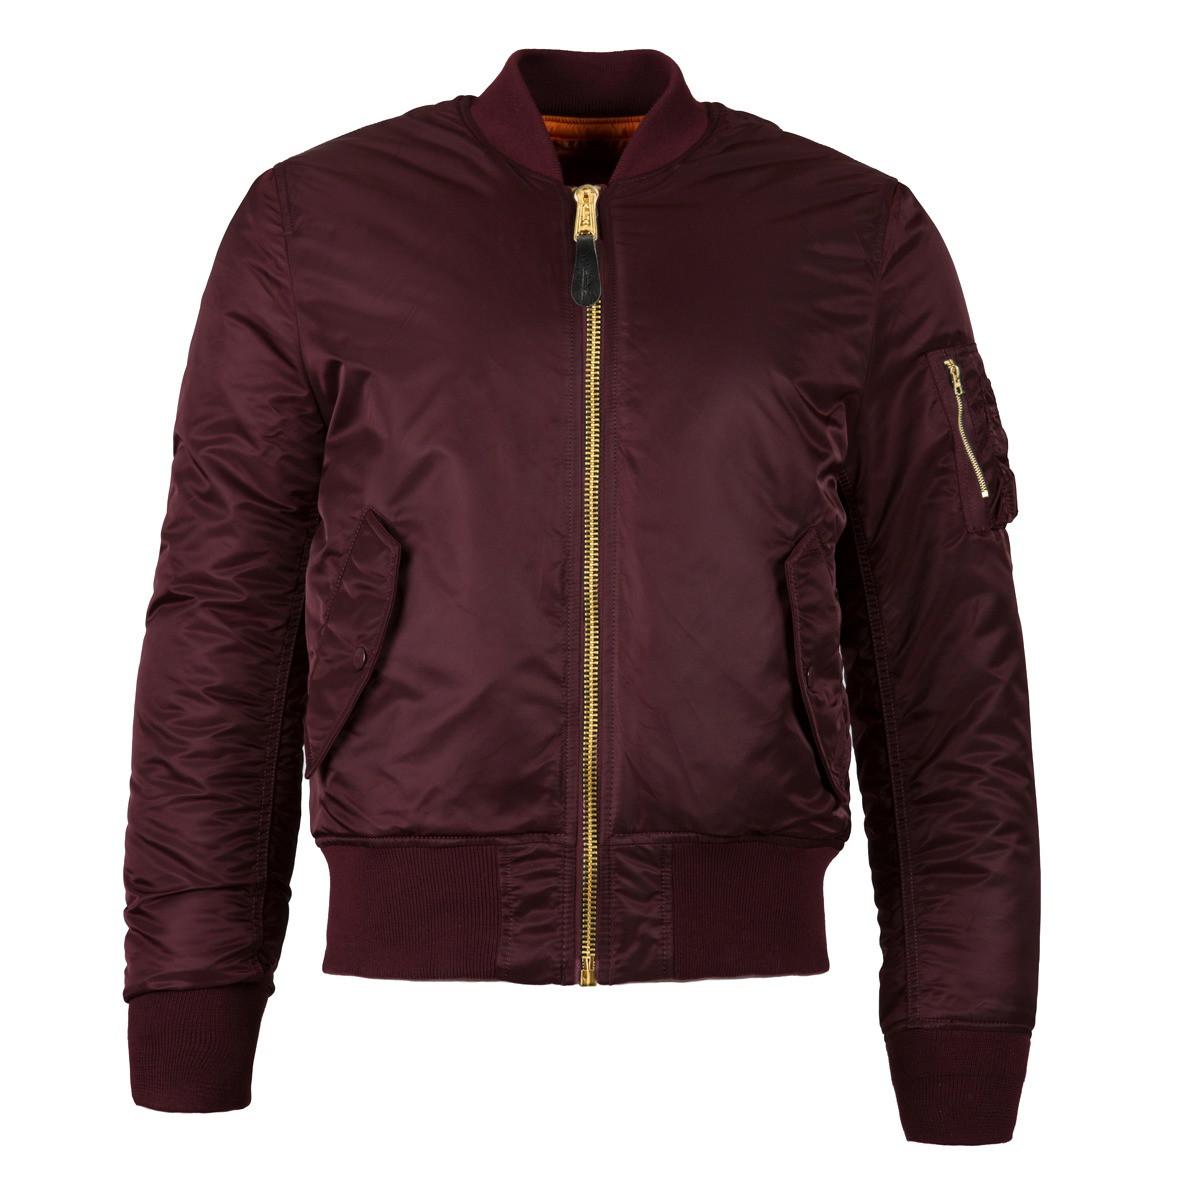 Куртка MA-1 SLIM FIT FLIGHT JACKET Alpha Industries демисезонная